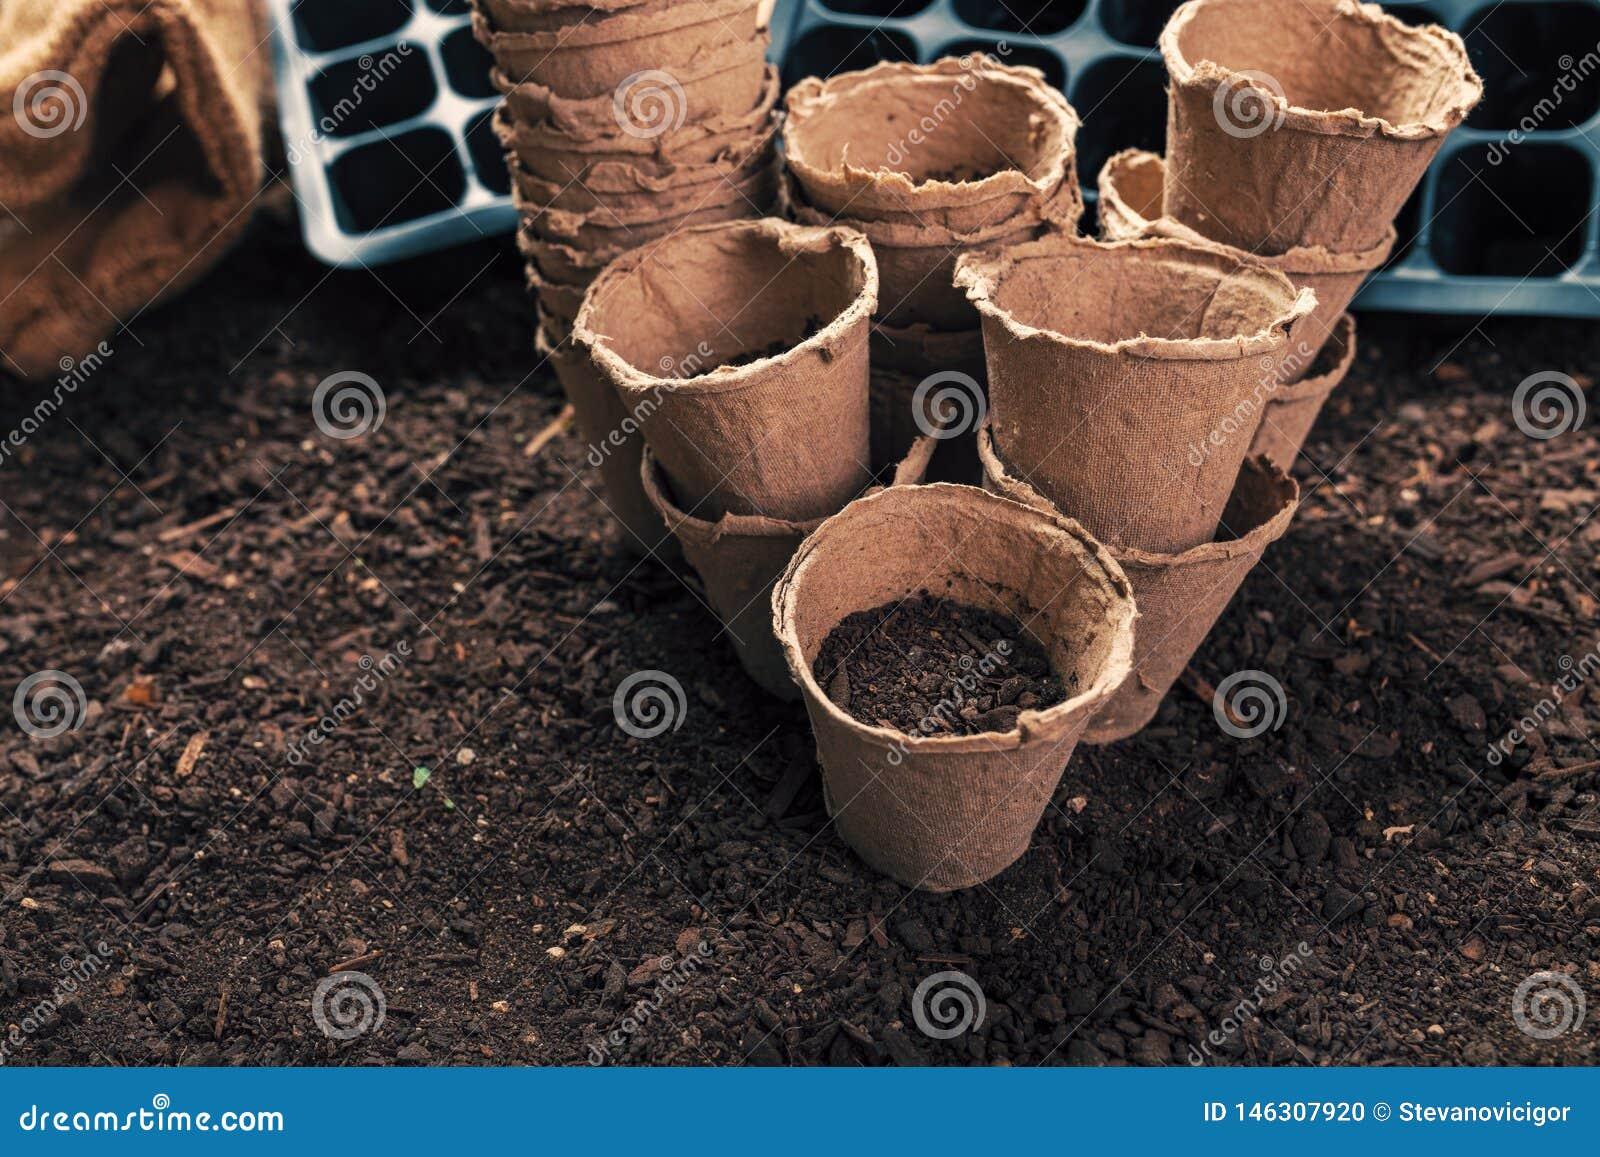 Biodegradable peat pots for organic farming food production